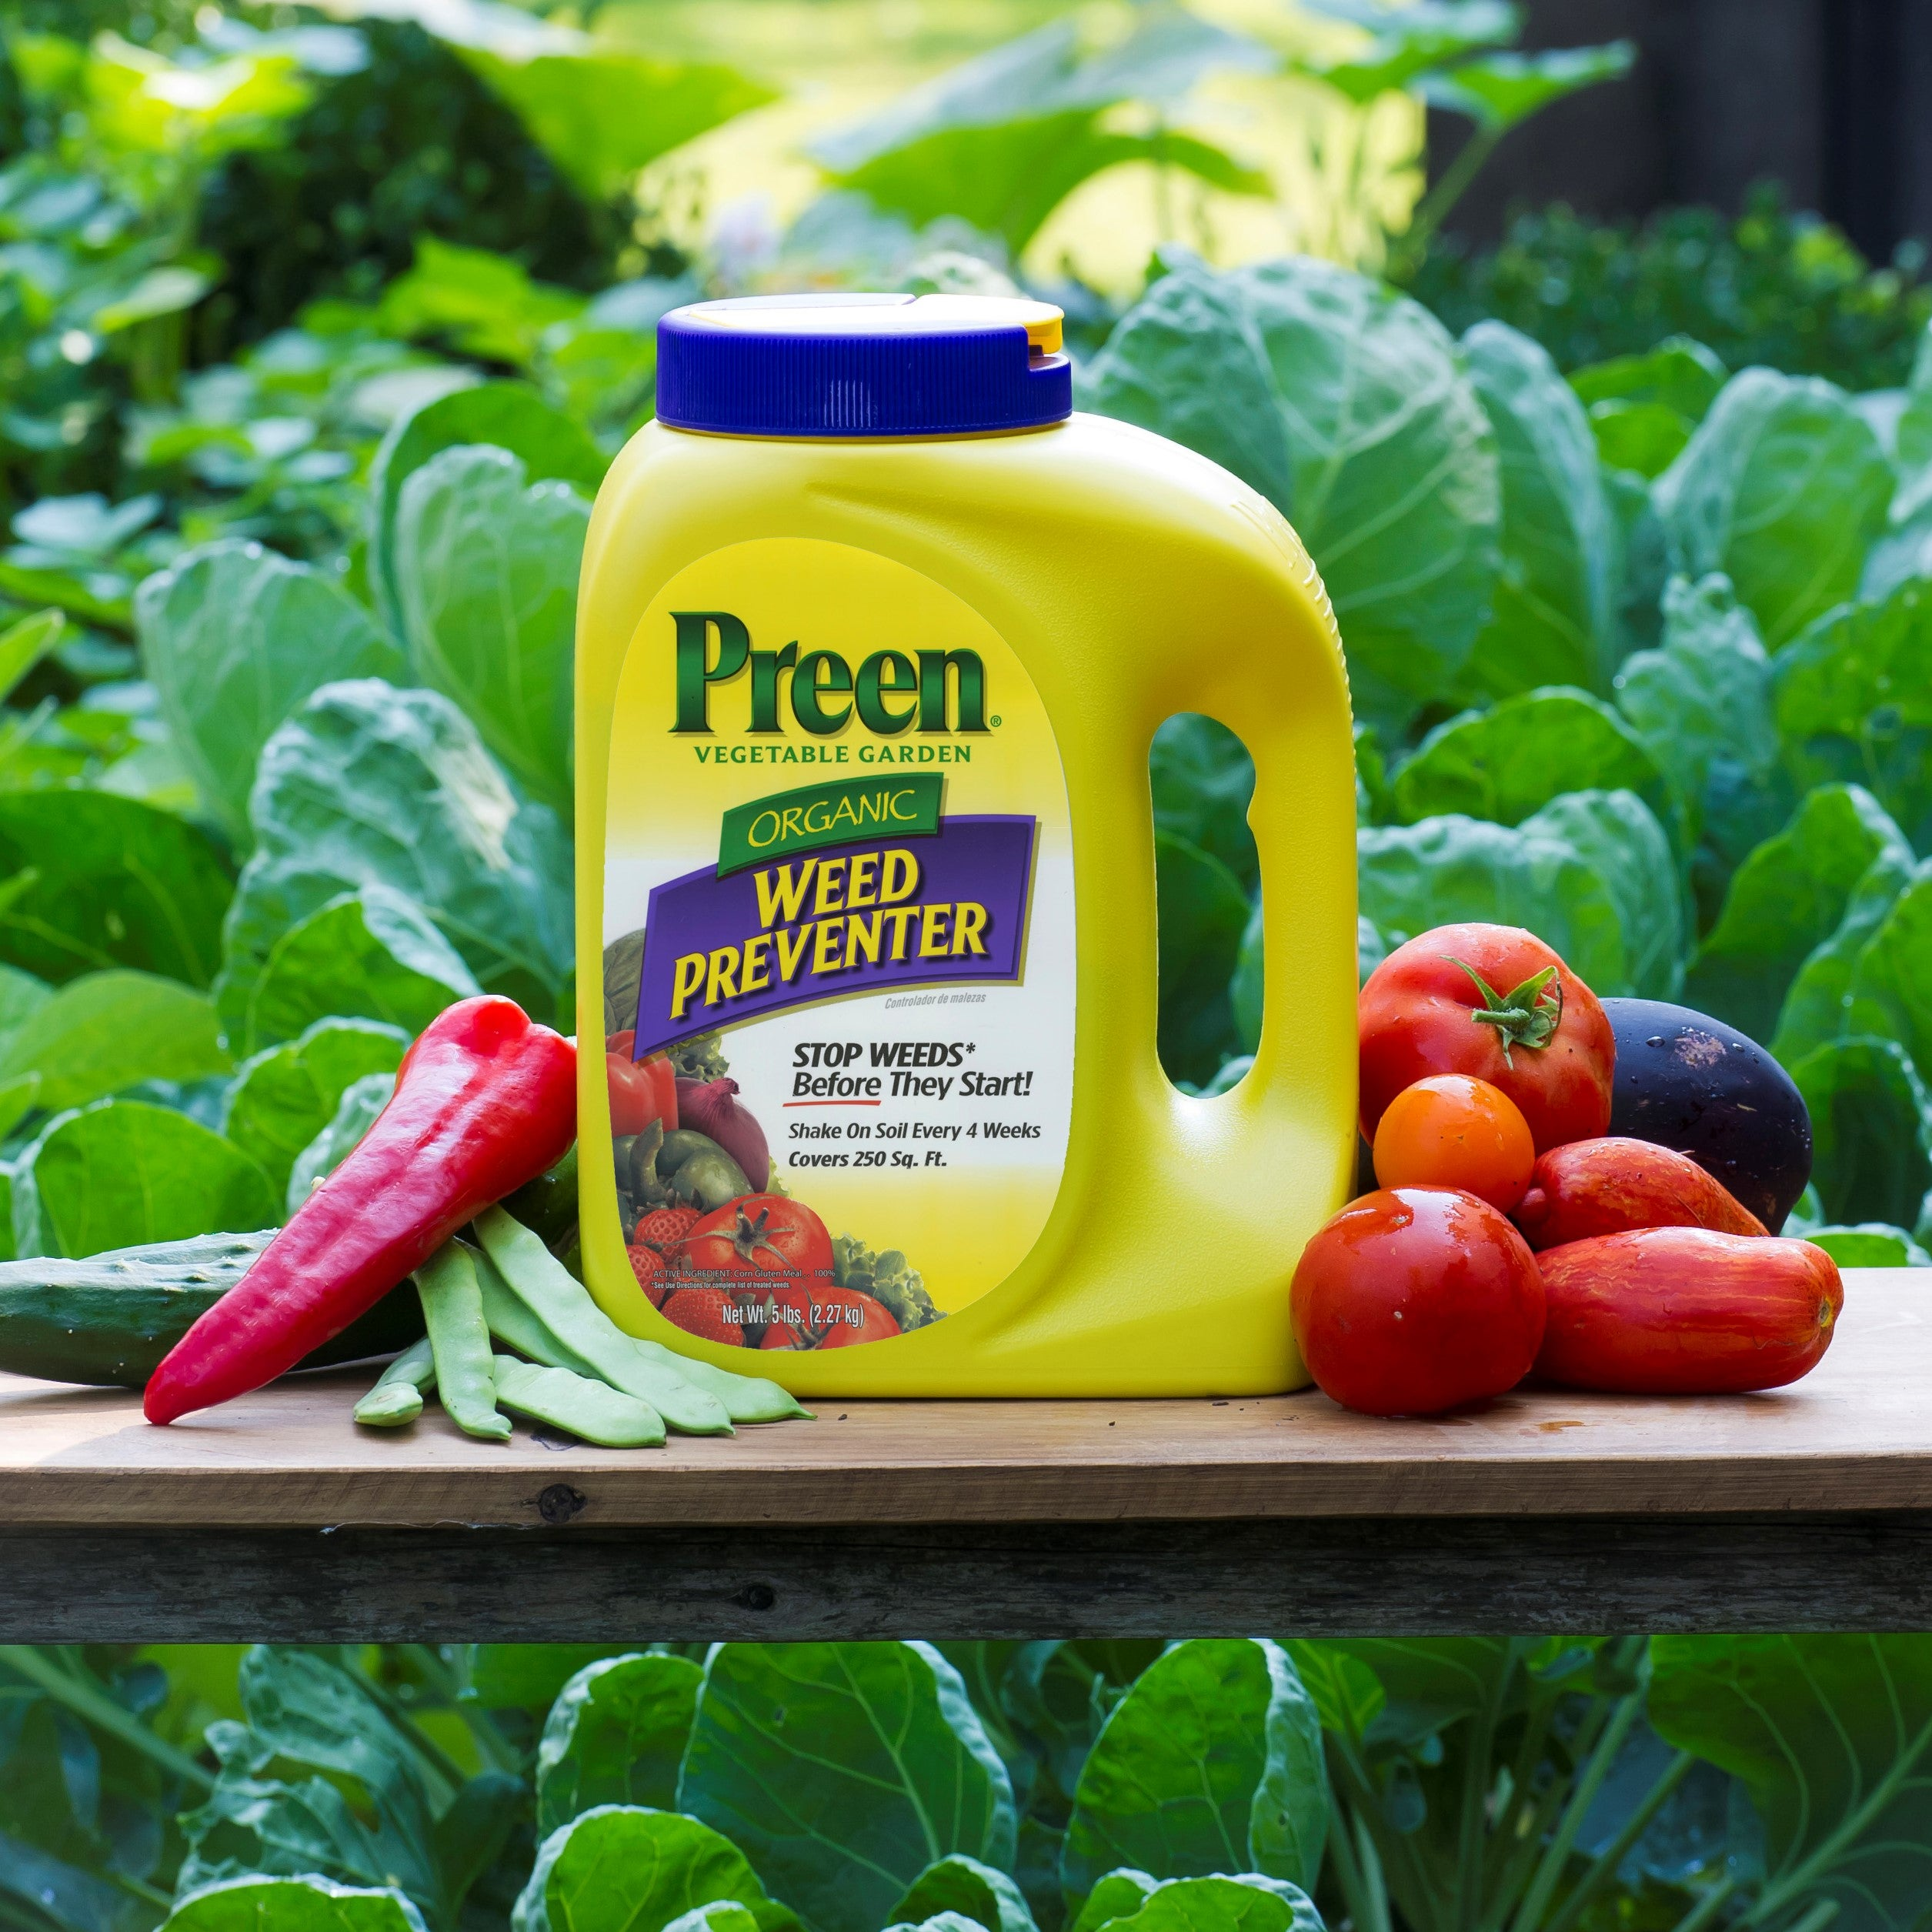 Preen vegetable garden weed preventer 5 lb ebay for How to use preen in vegetable garden